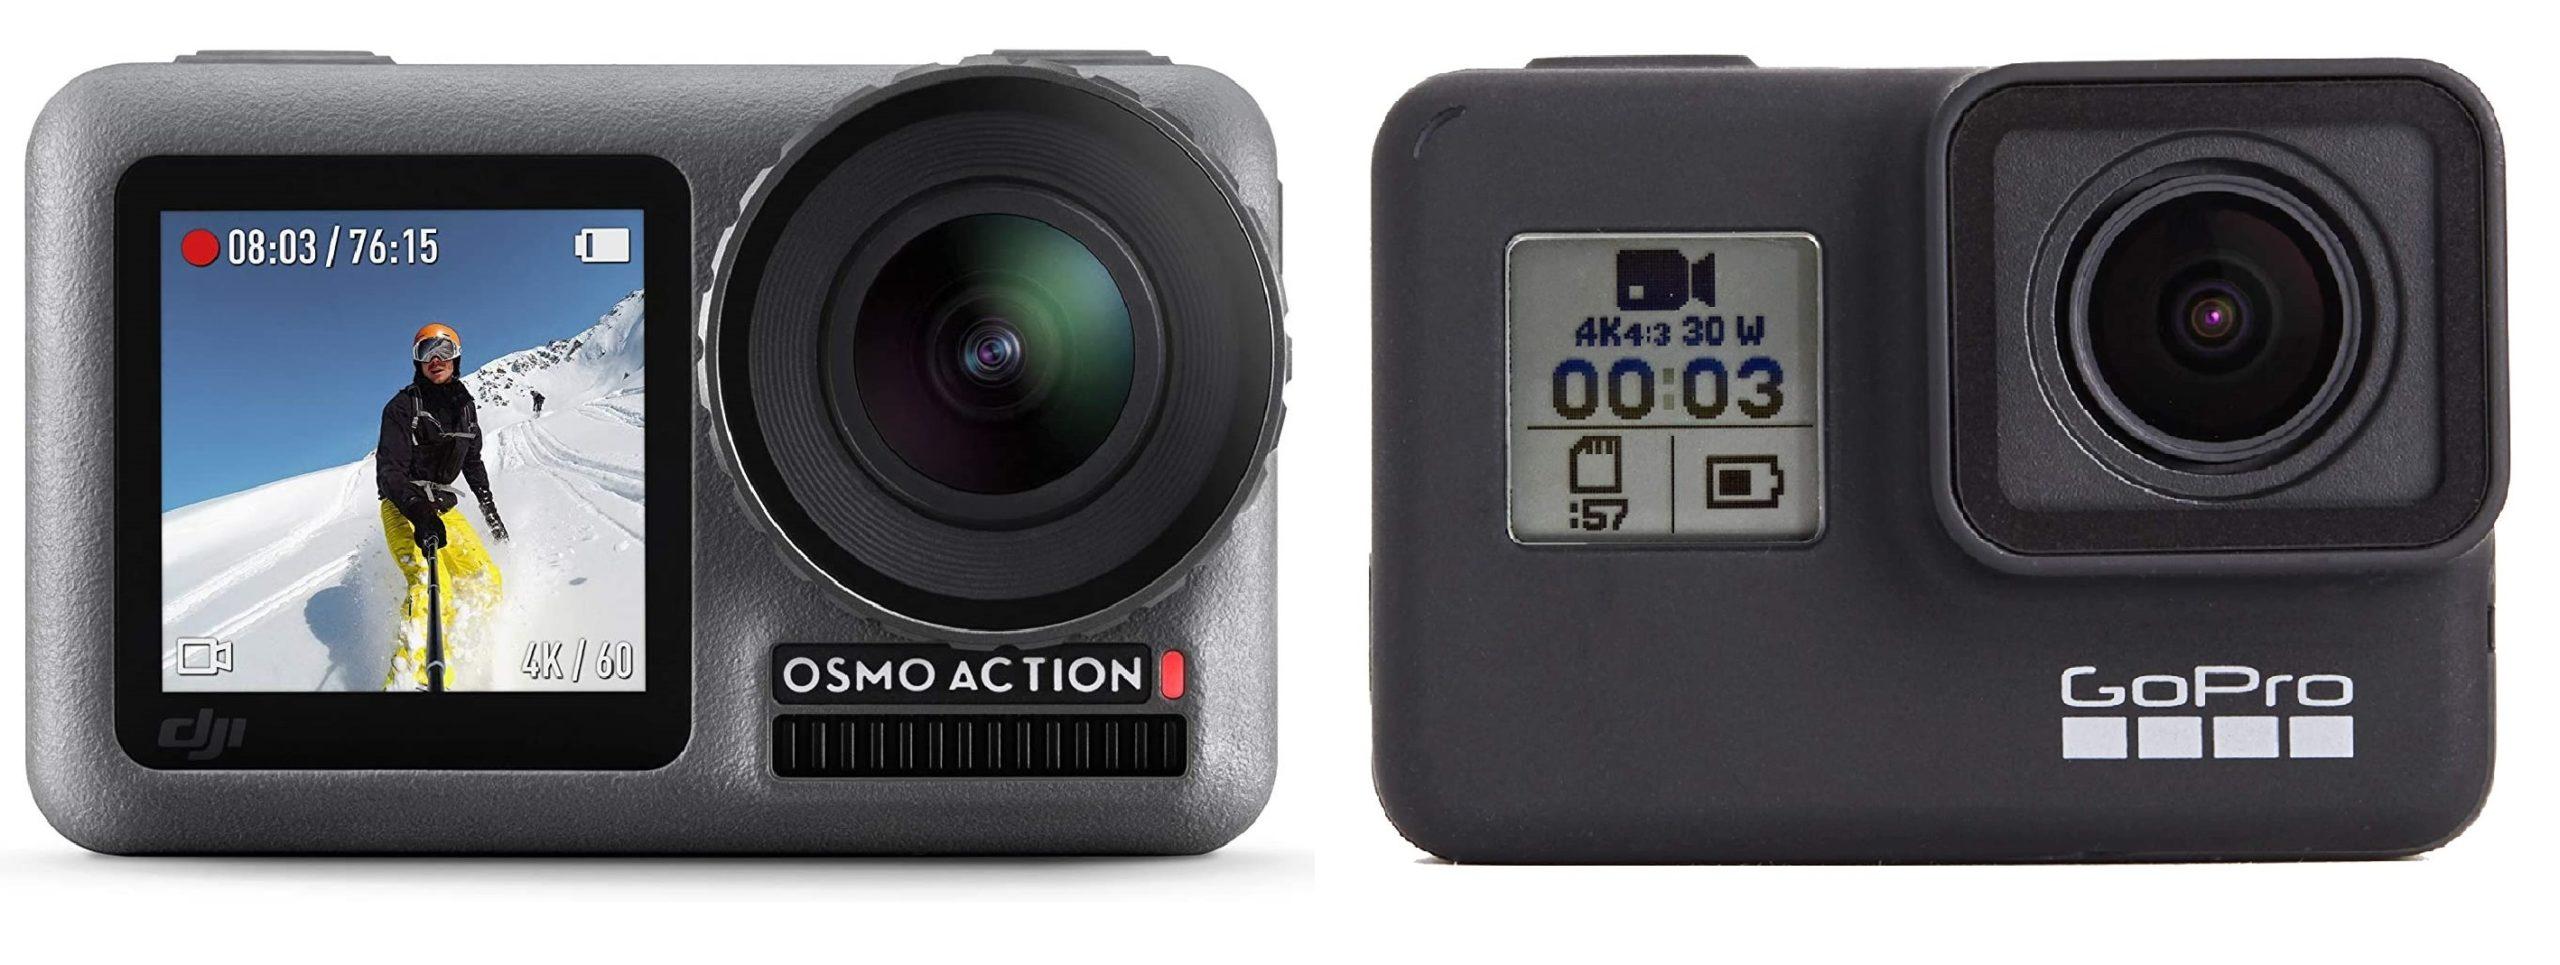 cameras for blogging Review